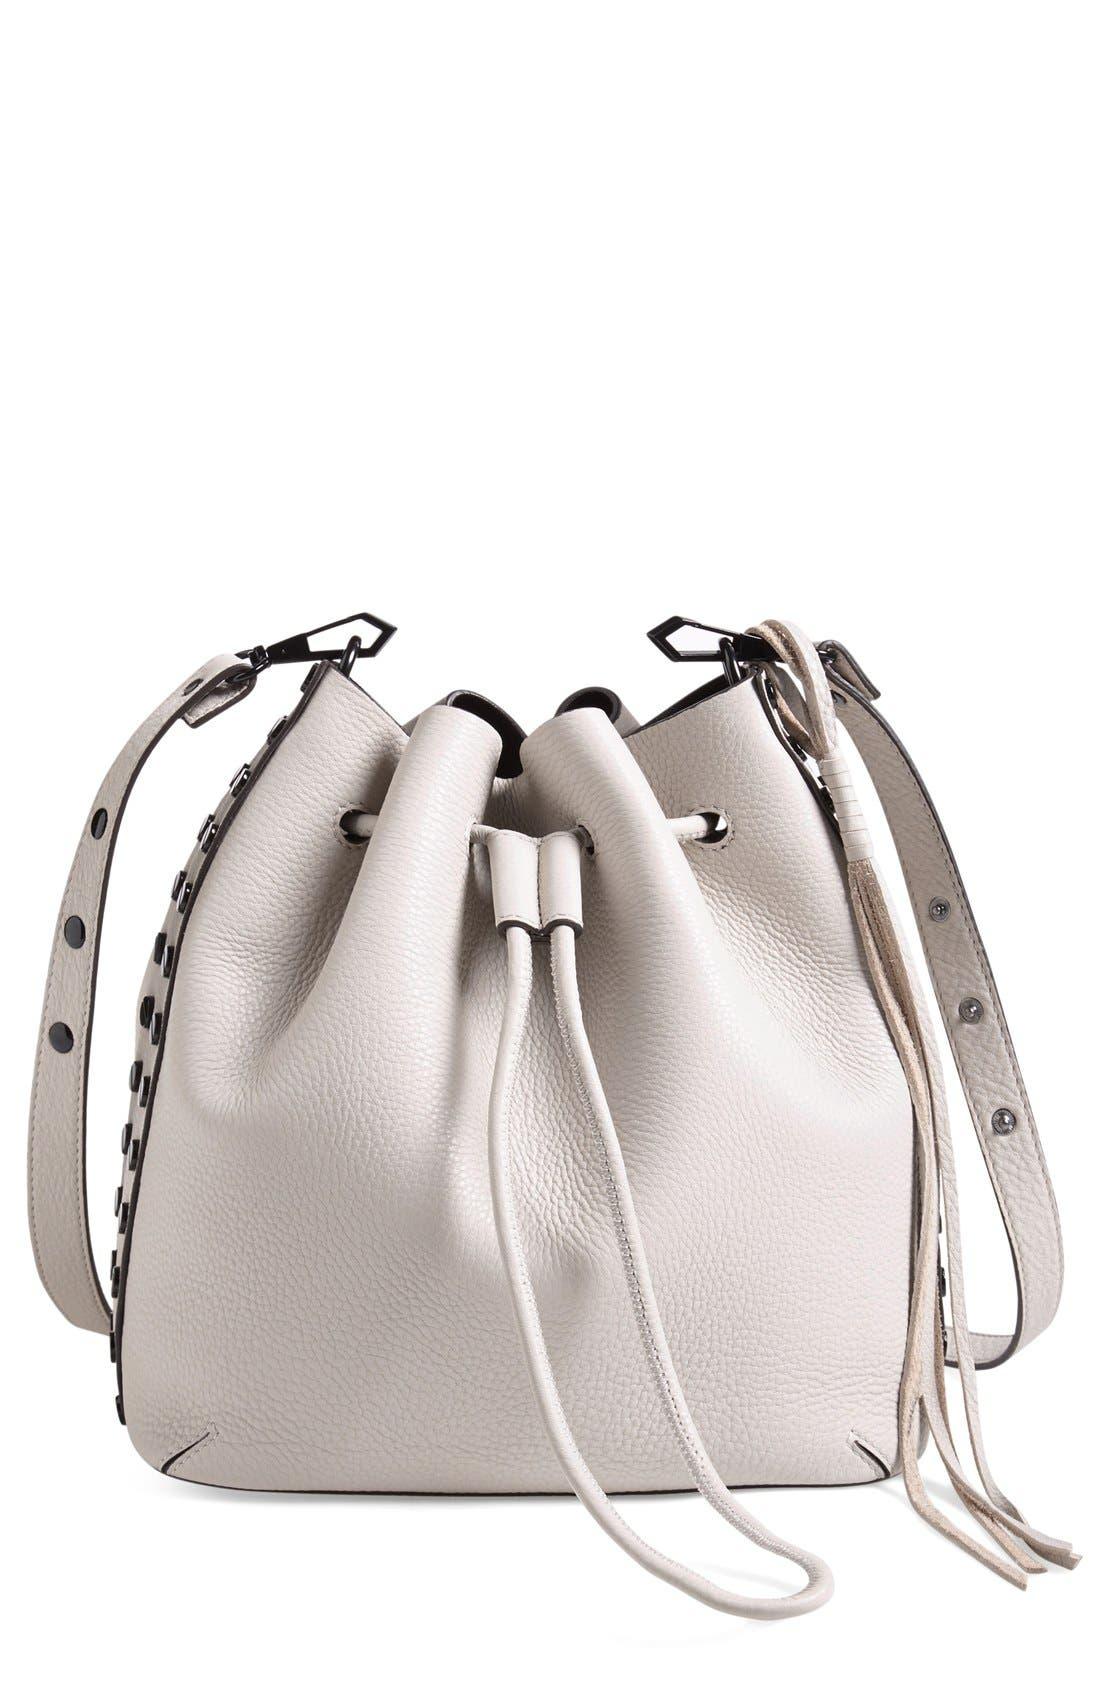 Alternate Image 1 Selected - Rebecca MinkoffScrew Stud Bucket Bag